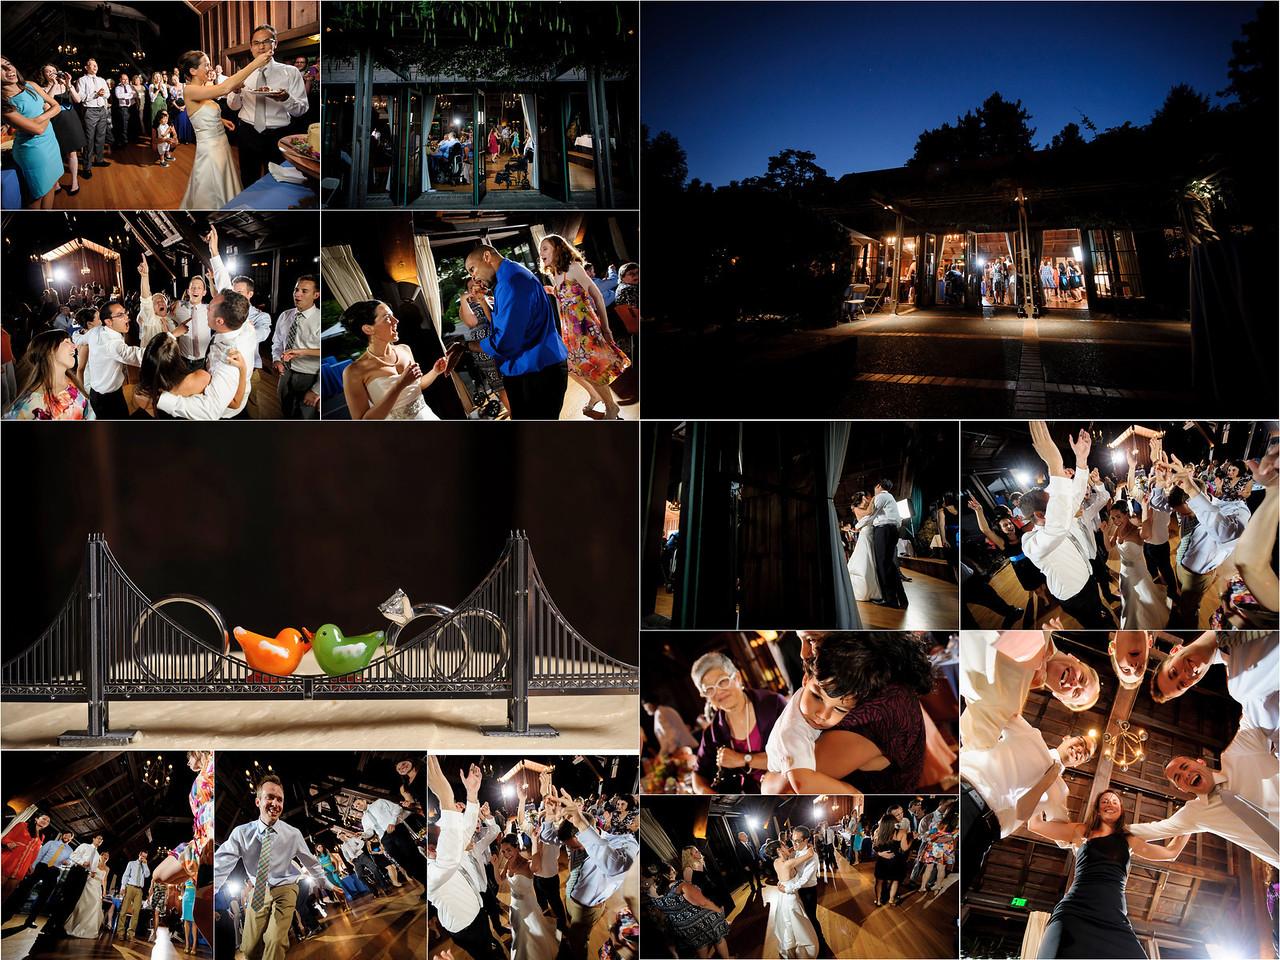 Alyssa_and_Paul_Wedding_Photography_4x6_Photo_Board_07